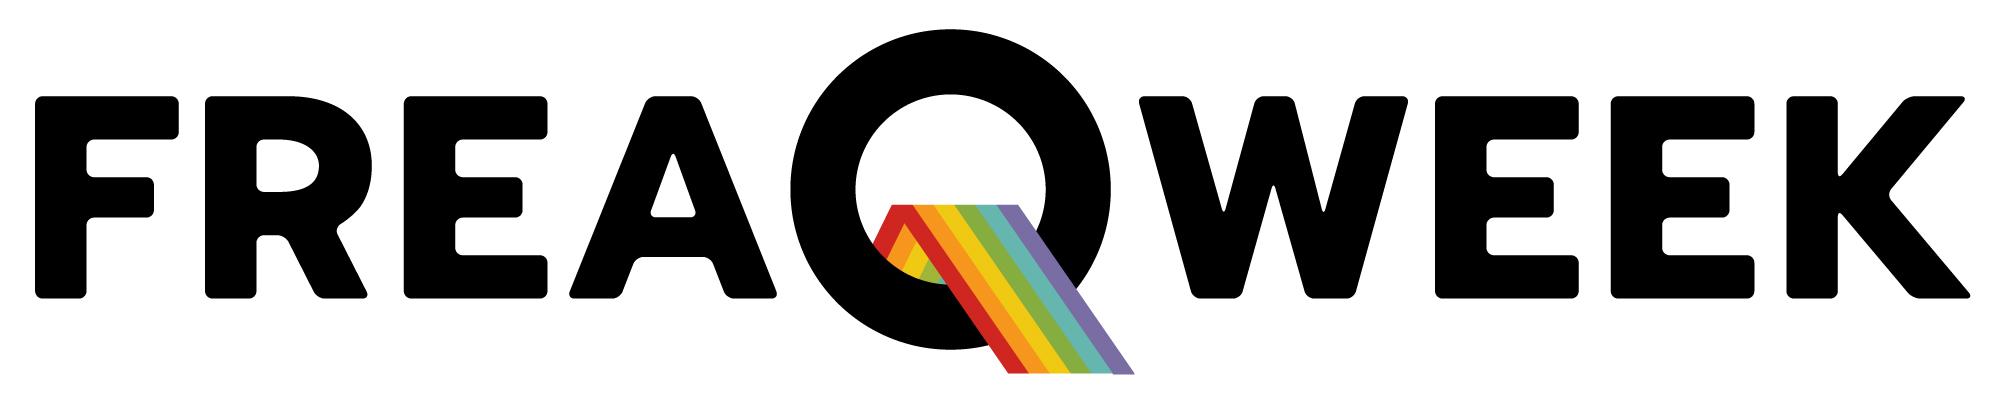 FreaQweek_logo_horizqinline_fullcolor.jpg